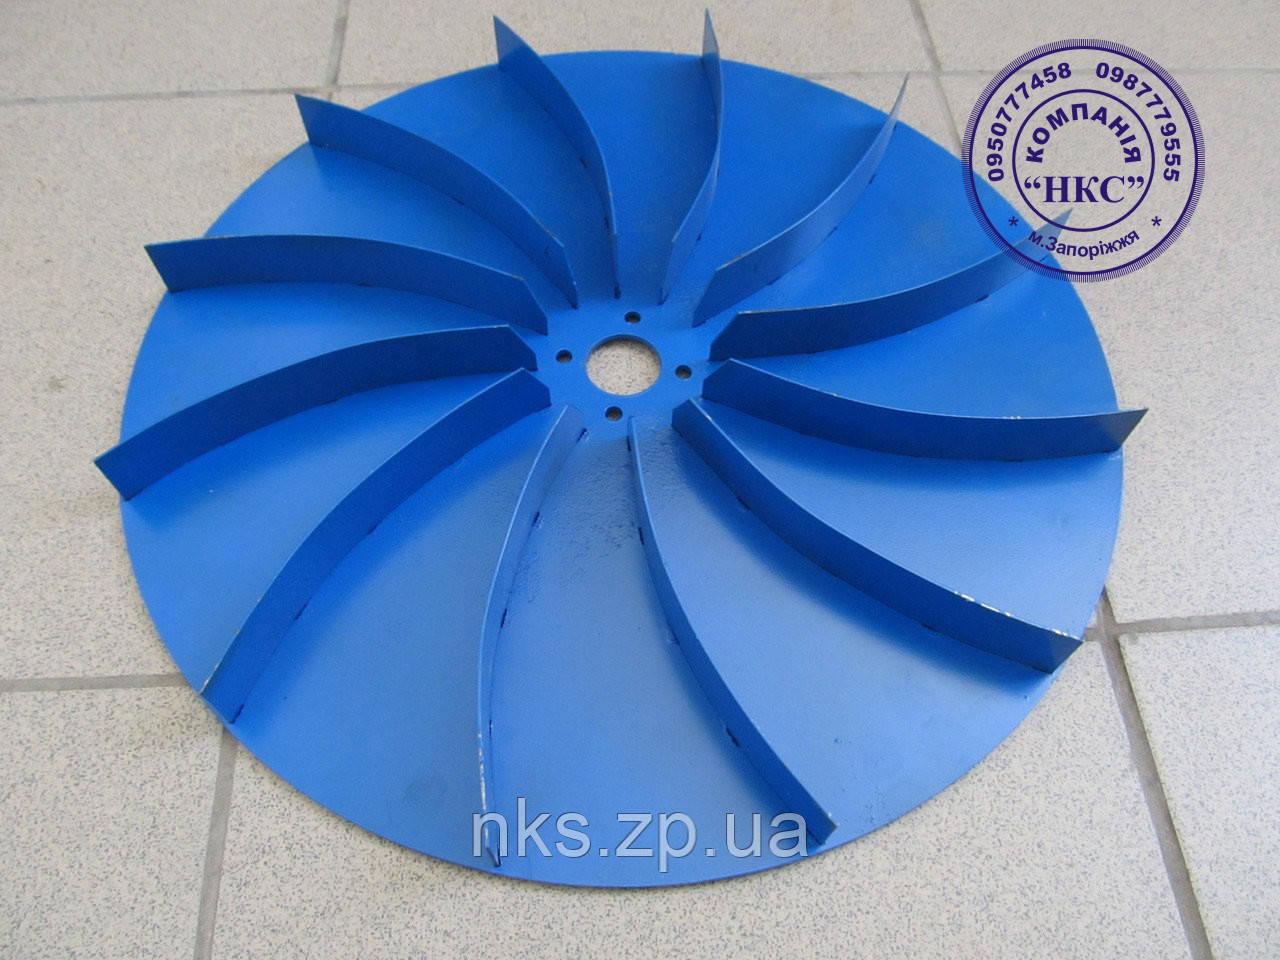 Ротор эксгаустера СПЧ-6М.